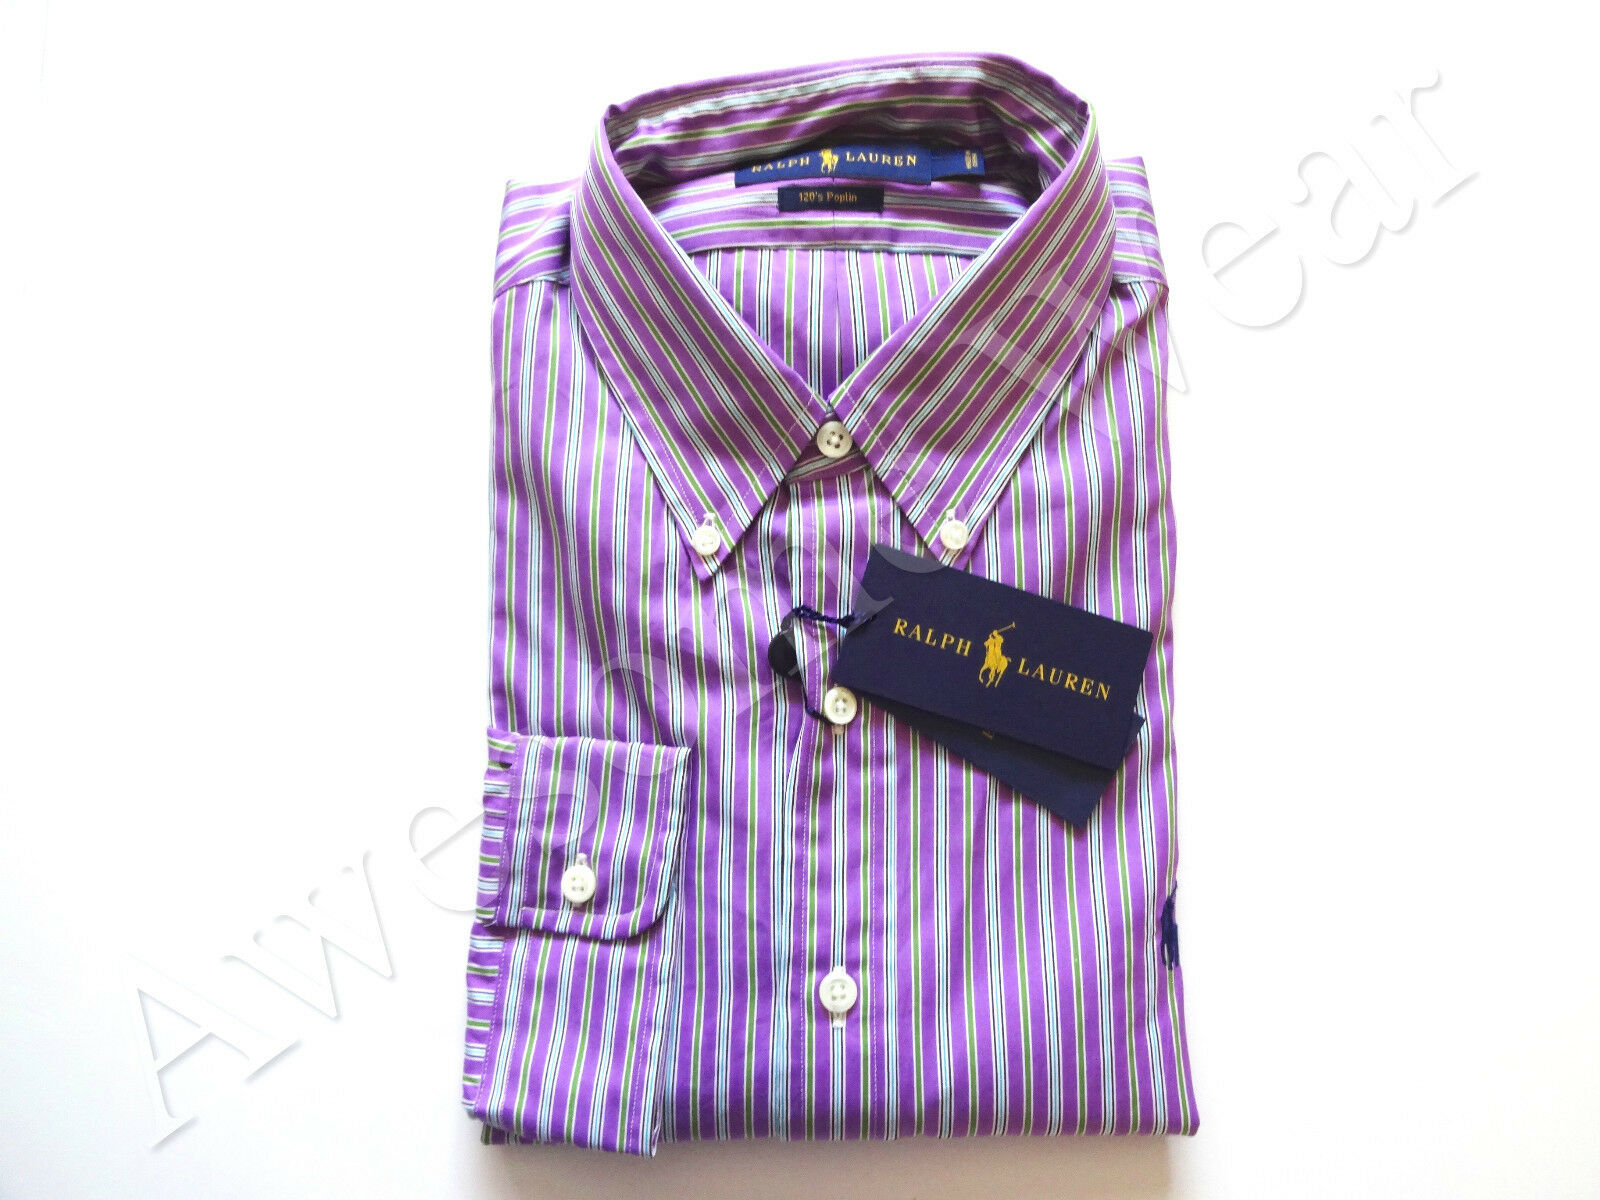 948c4f1e147 100 Percent Cotton Clergy Shirts